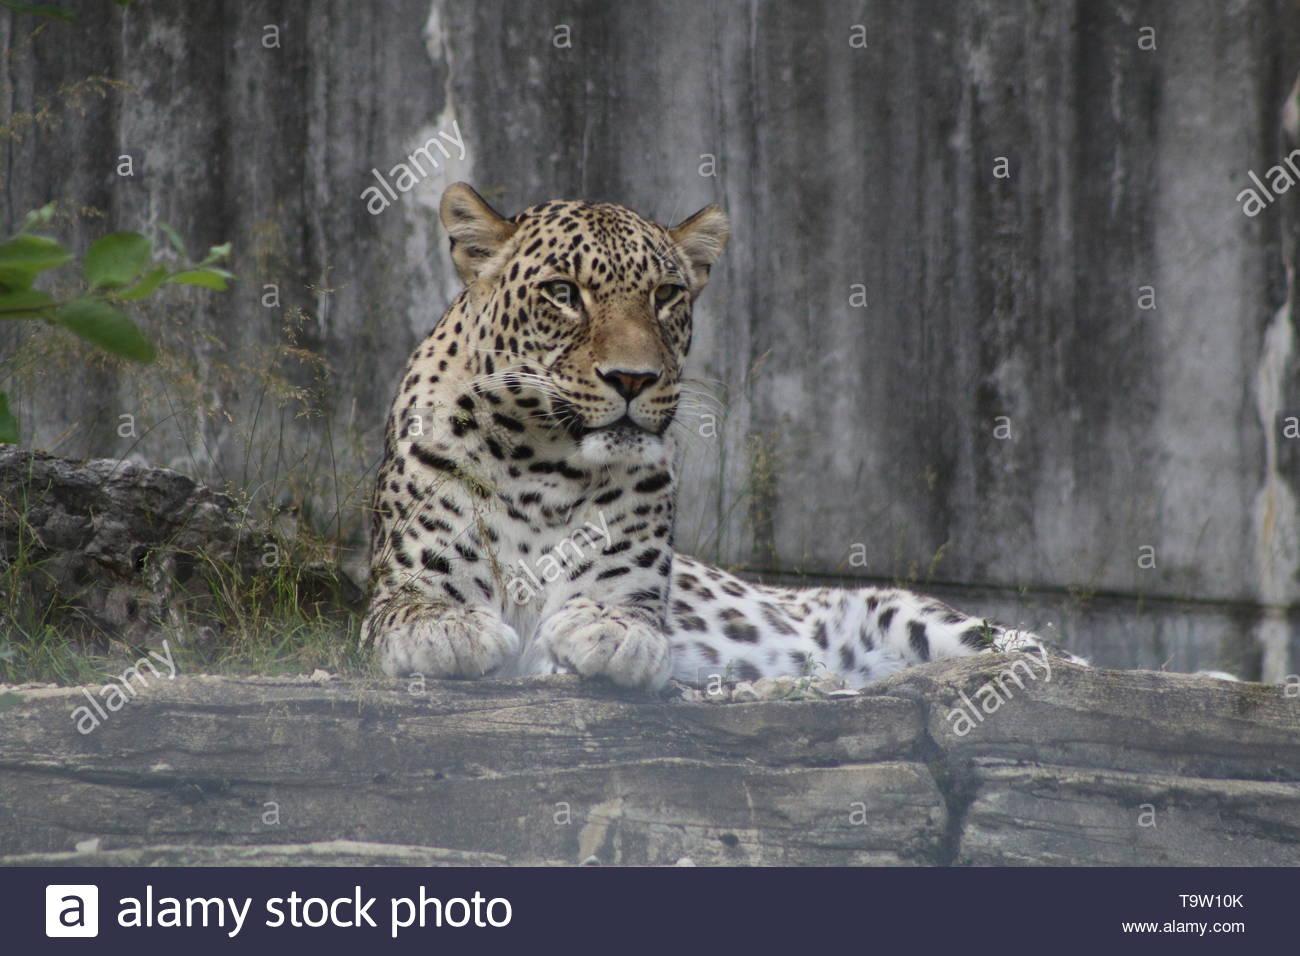 Wild cat takes a break. Leopard portrait - Stock Image